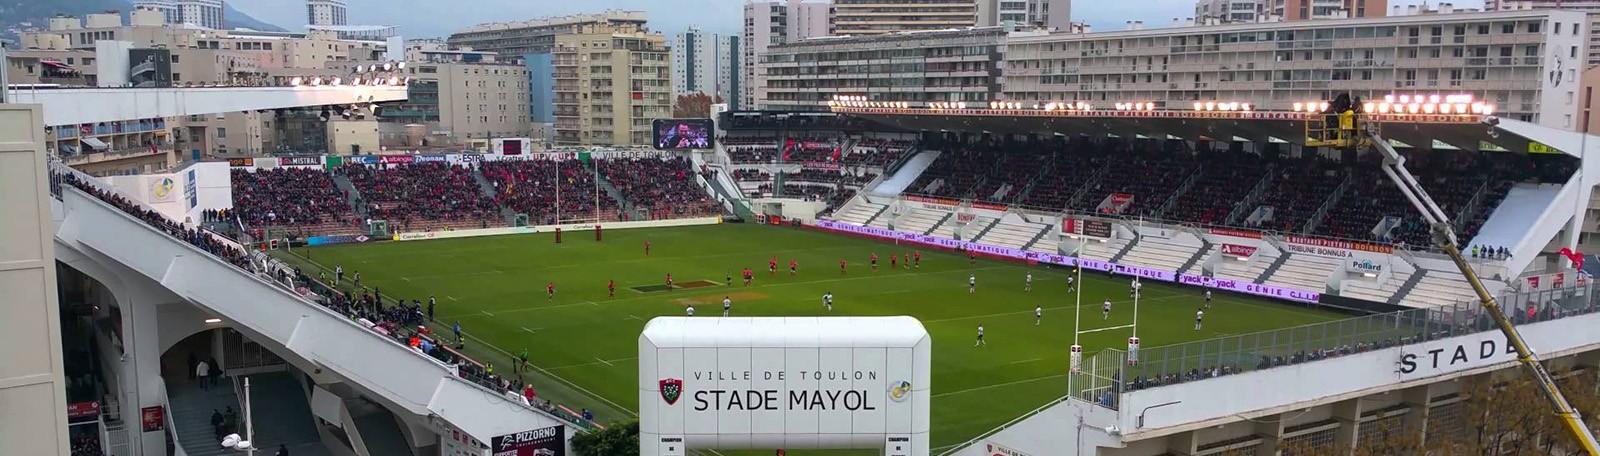 Stationner à Toulon Mayol Centre